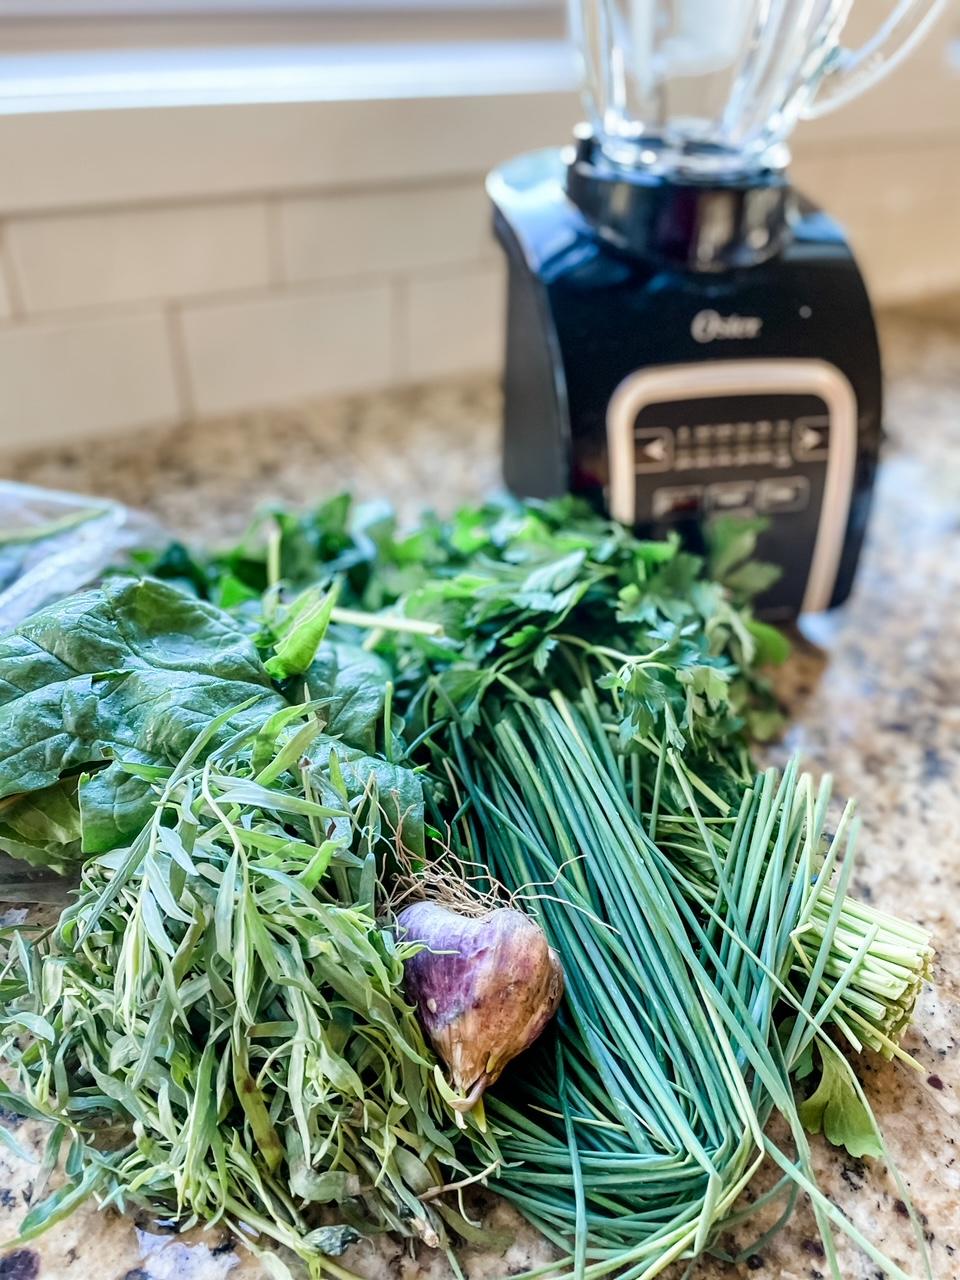 The herbs for the Homemade Green Goddess Salad Dressing, not yet prepped